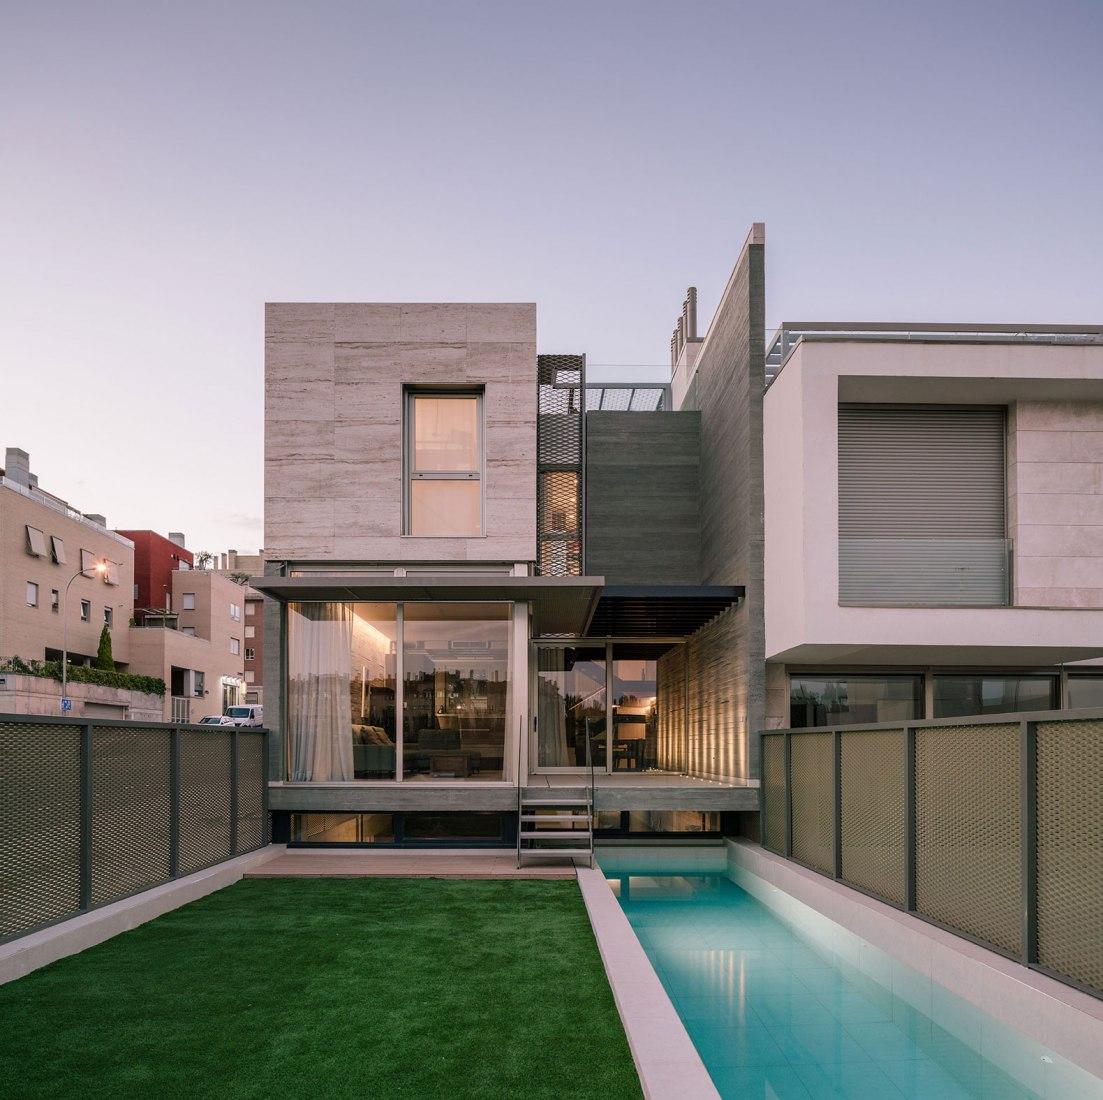 Sierra House by Steyn Studio. Photograph by Imagen Subliminal. Miguel de Guzmán / Rocío Romero.